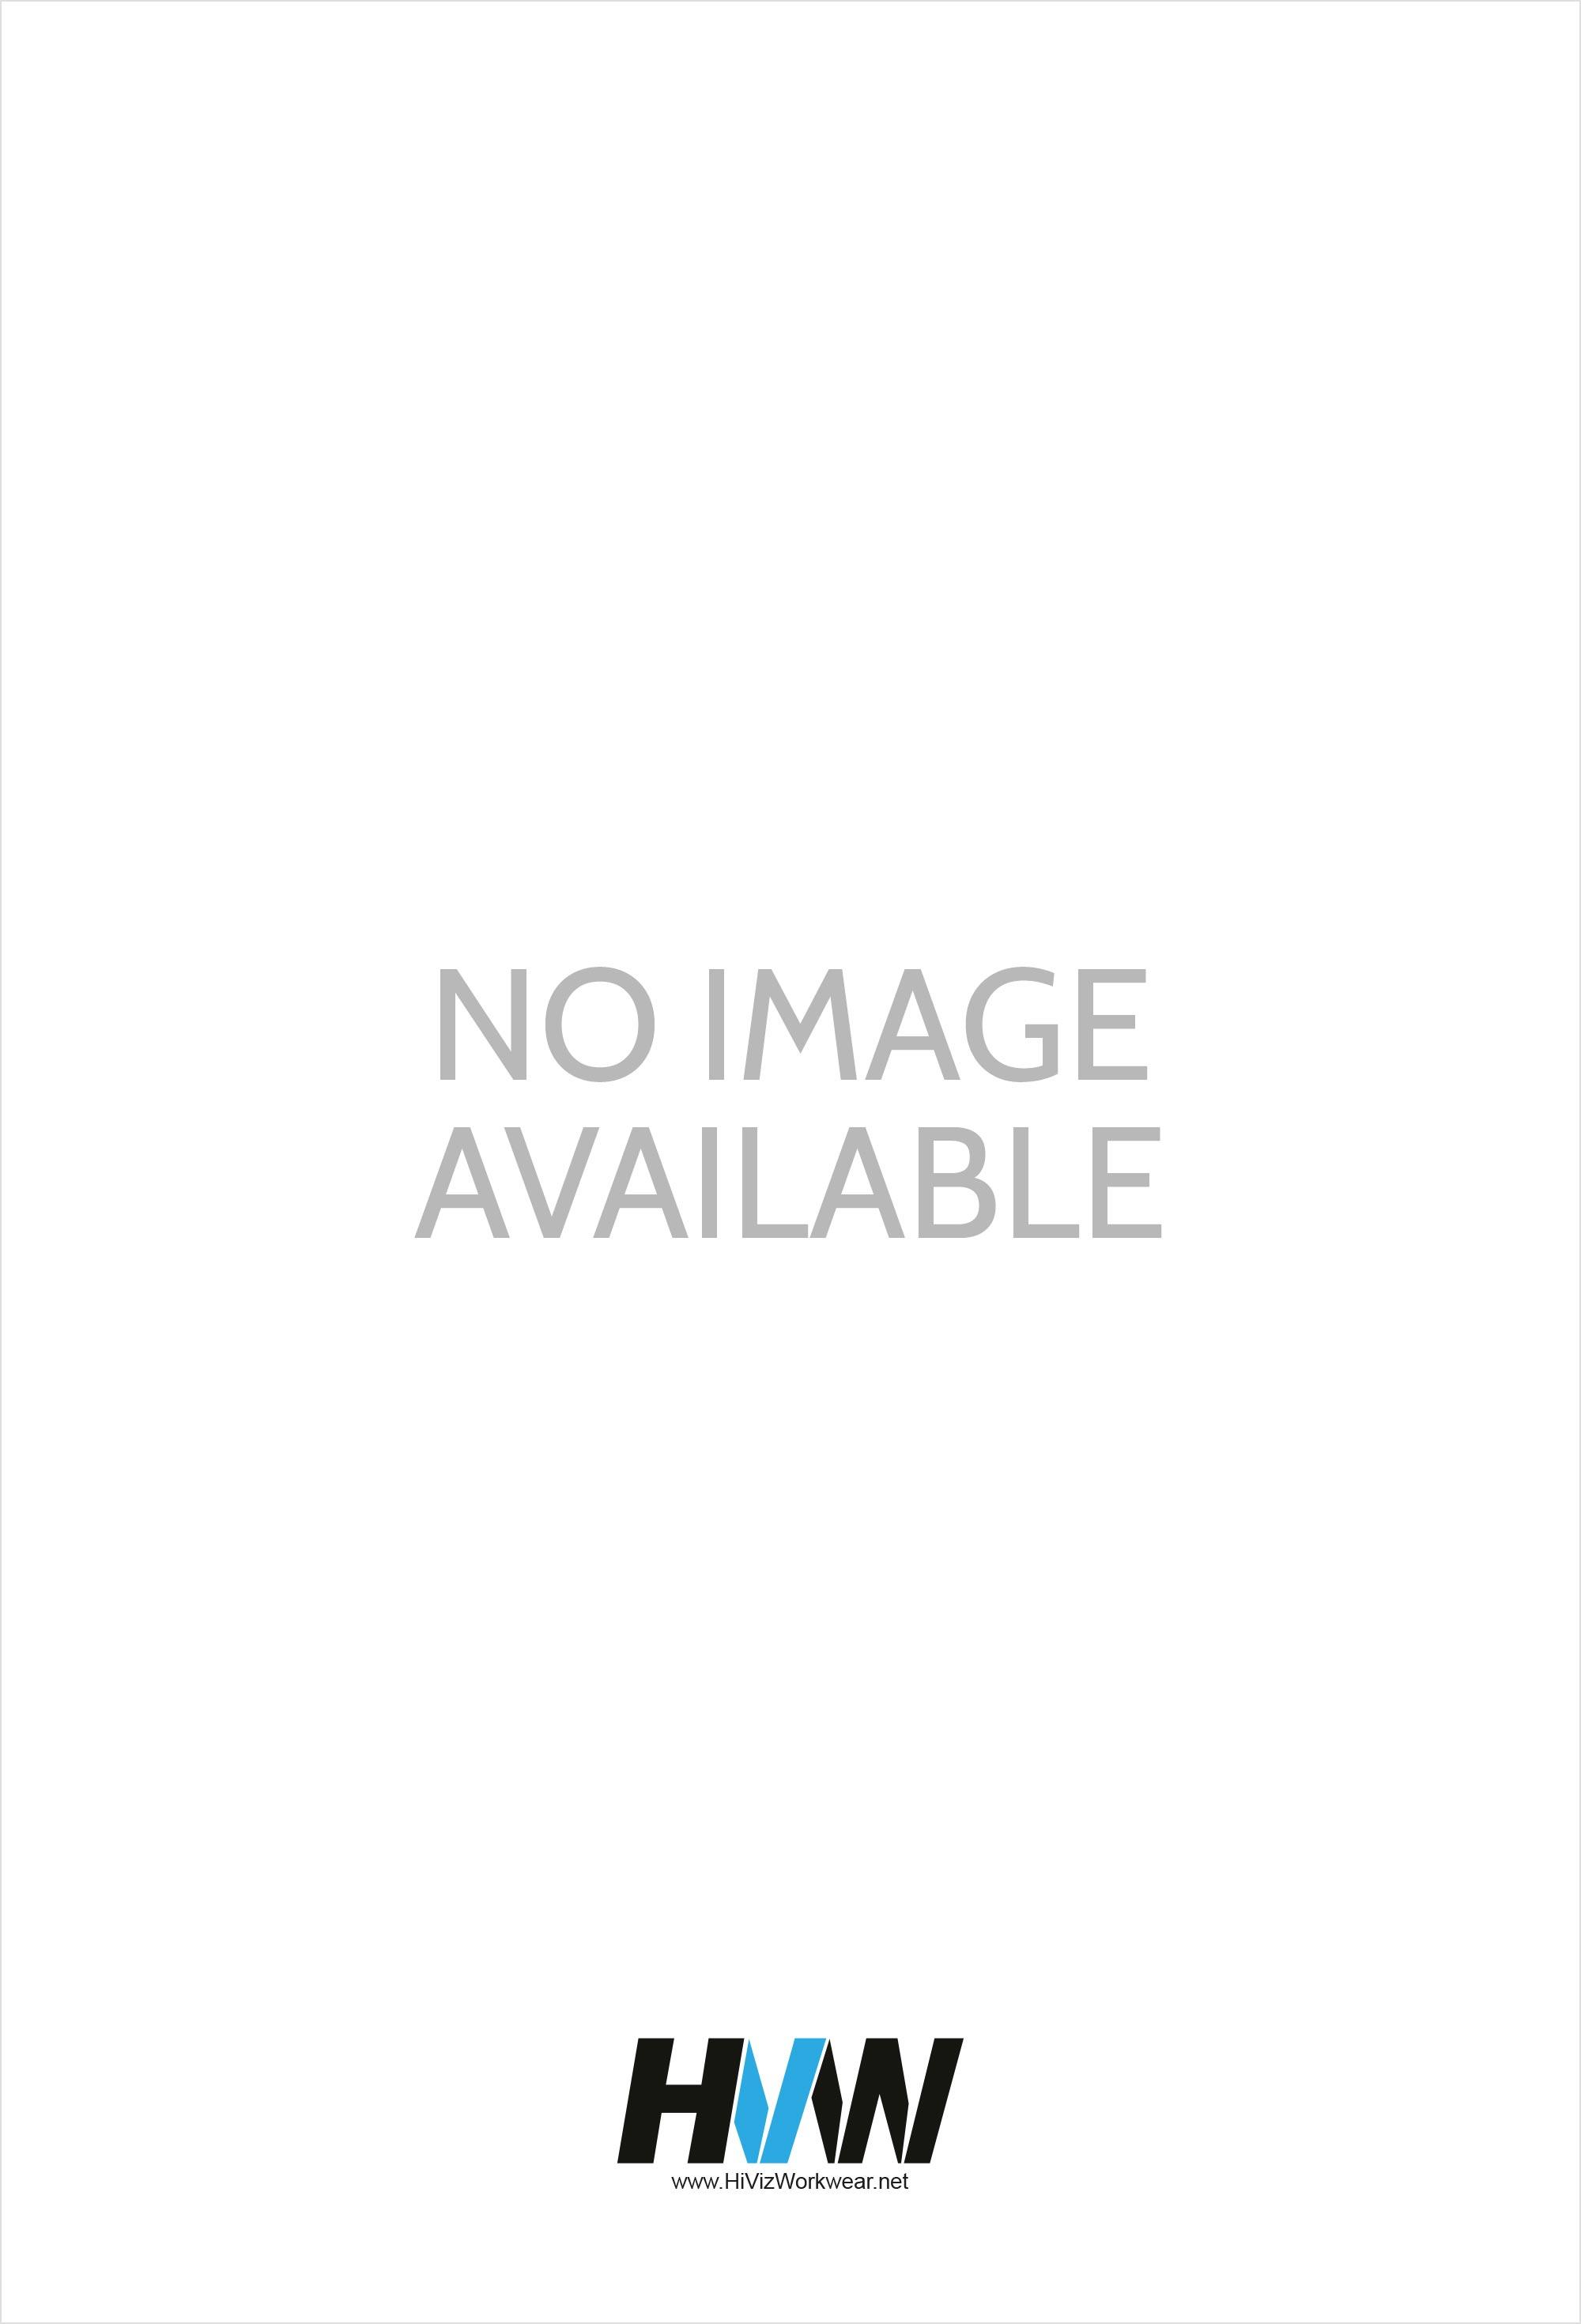 KK191 Slim Fit Business Short Sleeved Shirt  (Collar Size 14.0 To 18.0)